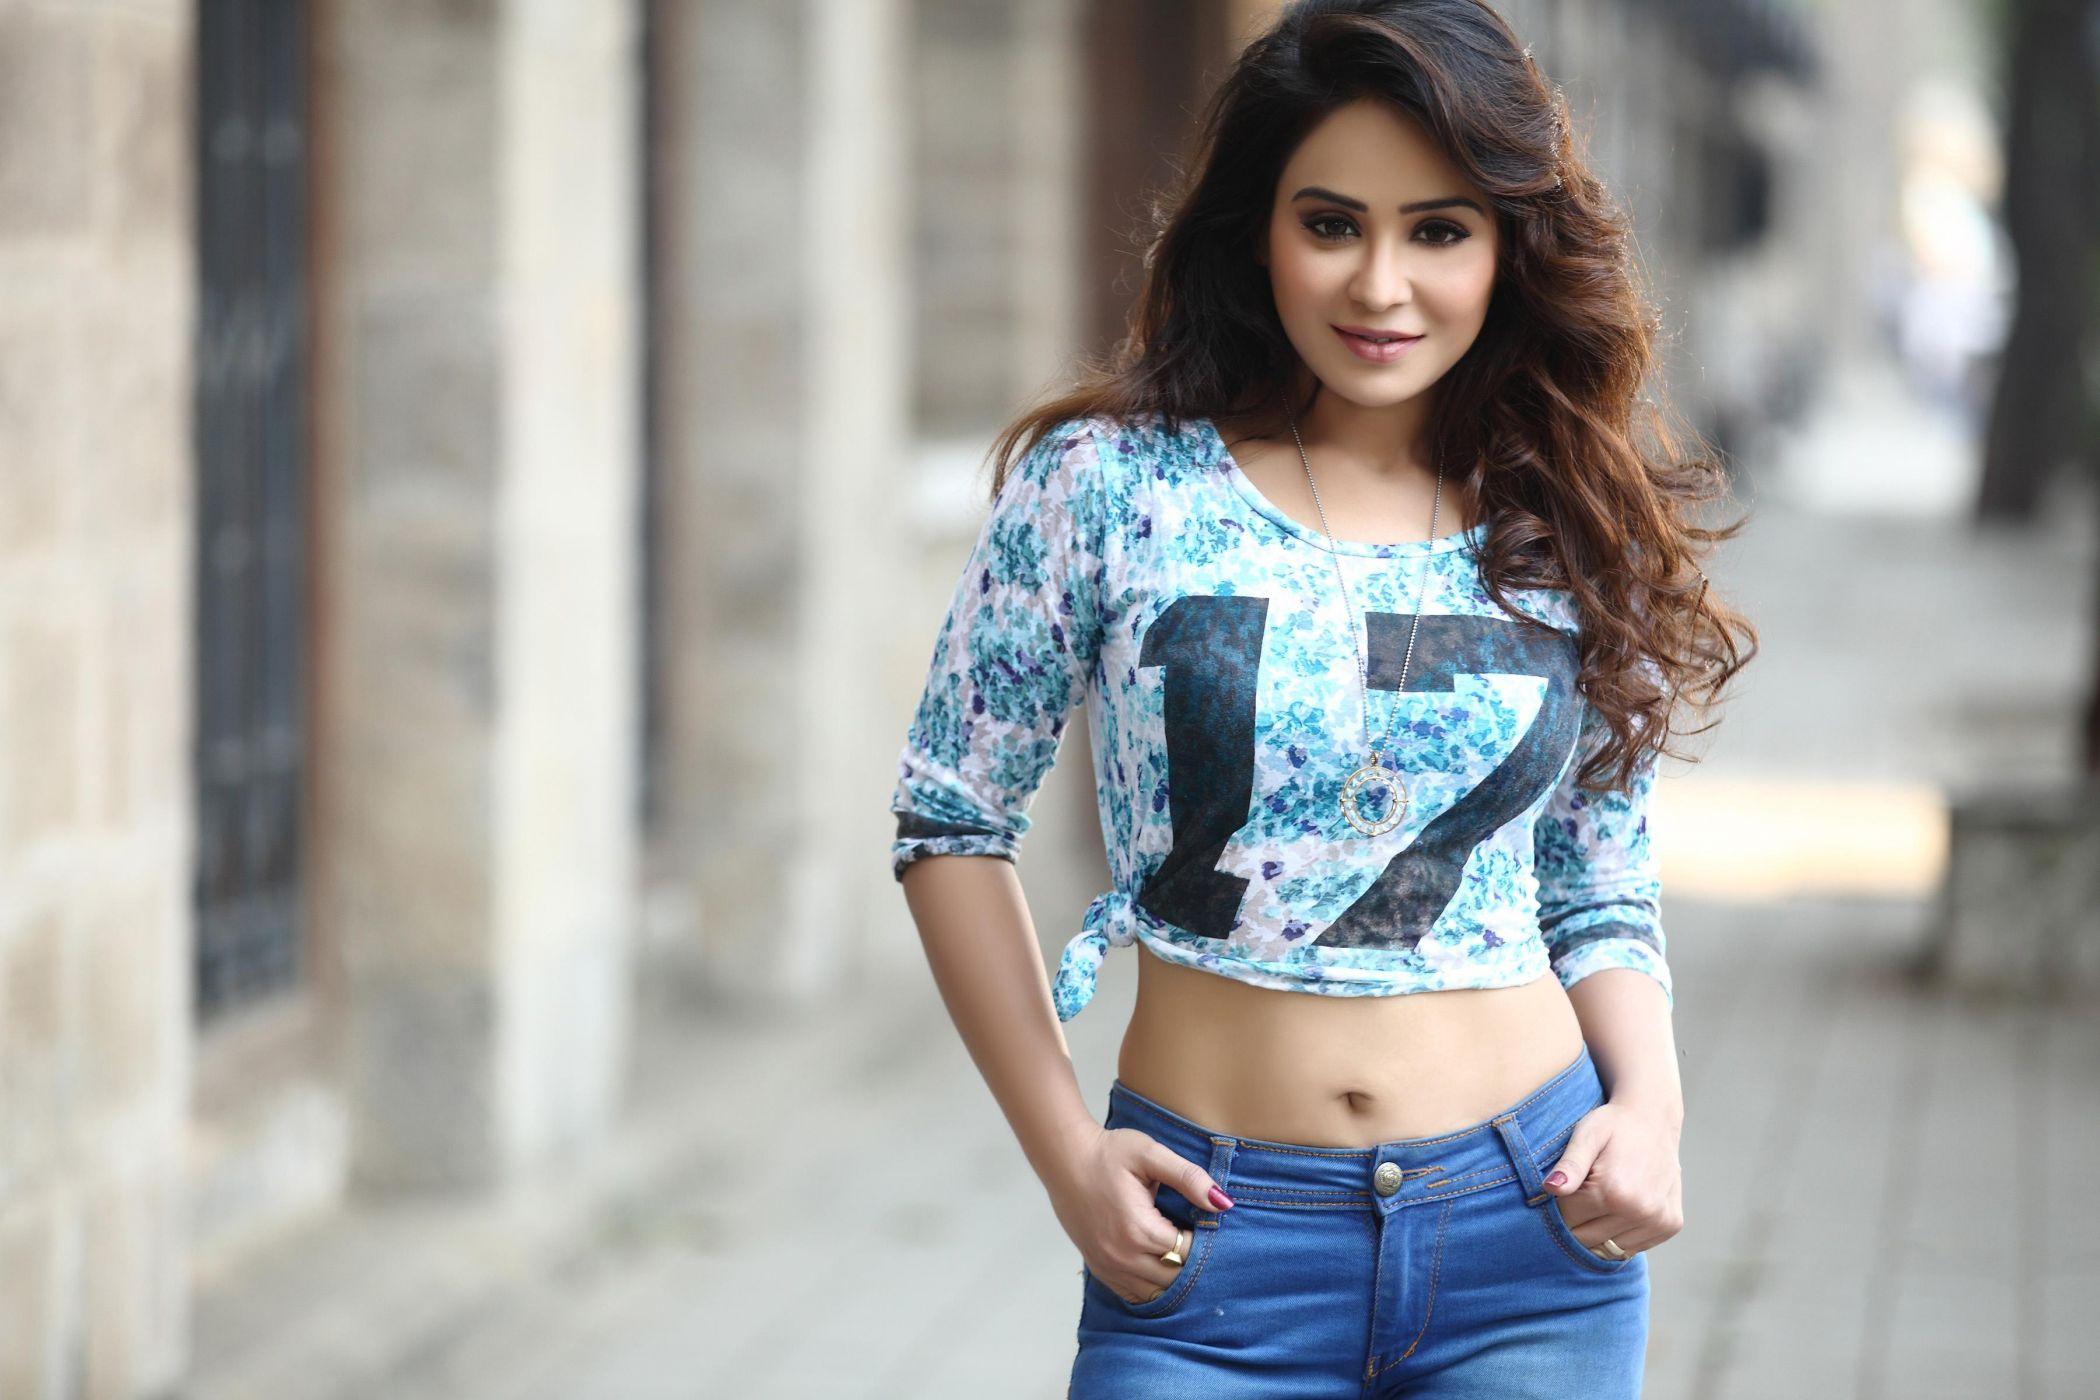 Hot hindi girl, free swinger sites new jersey